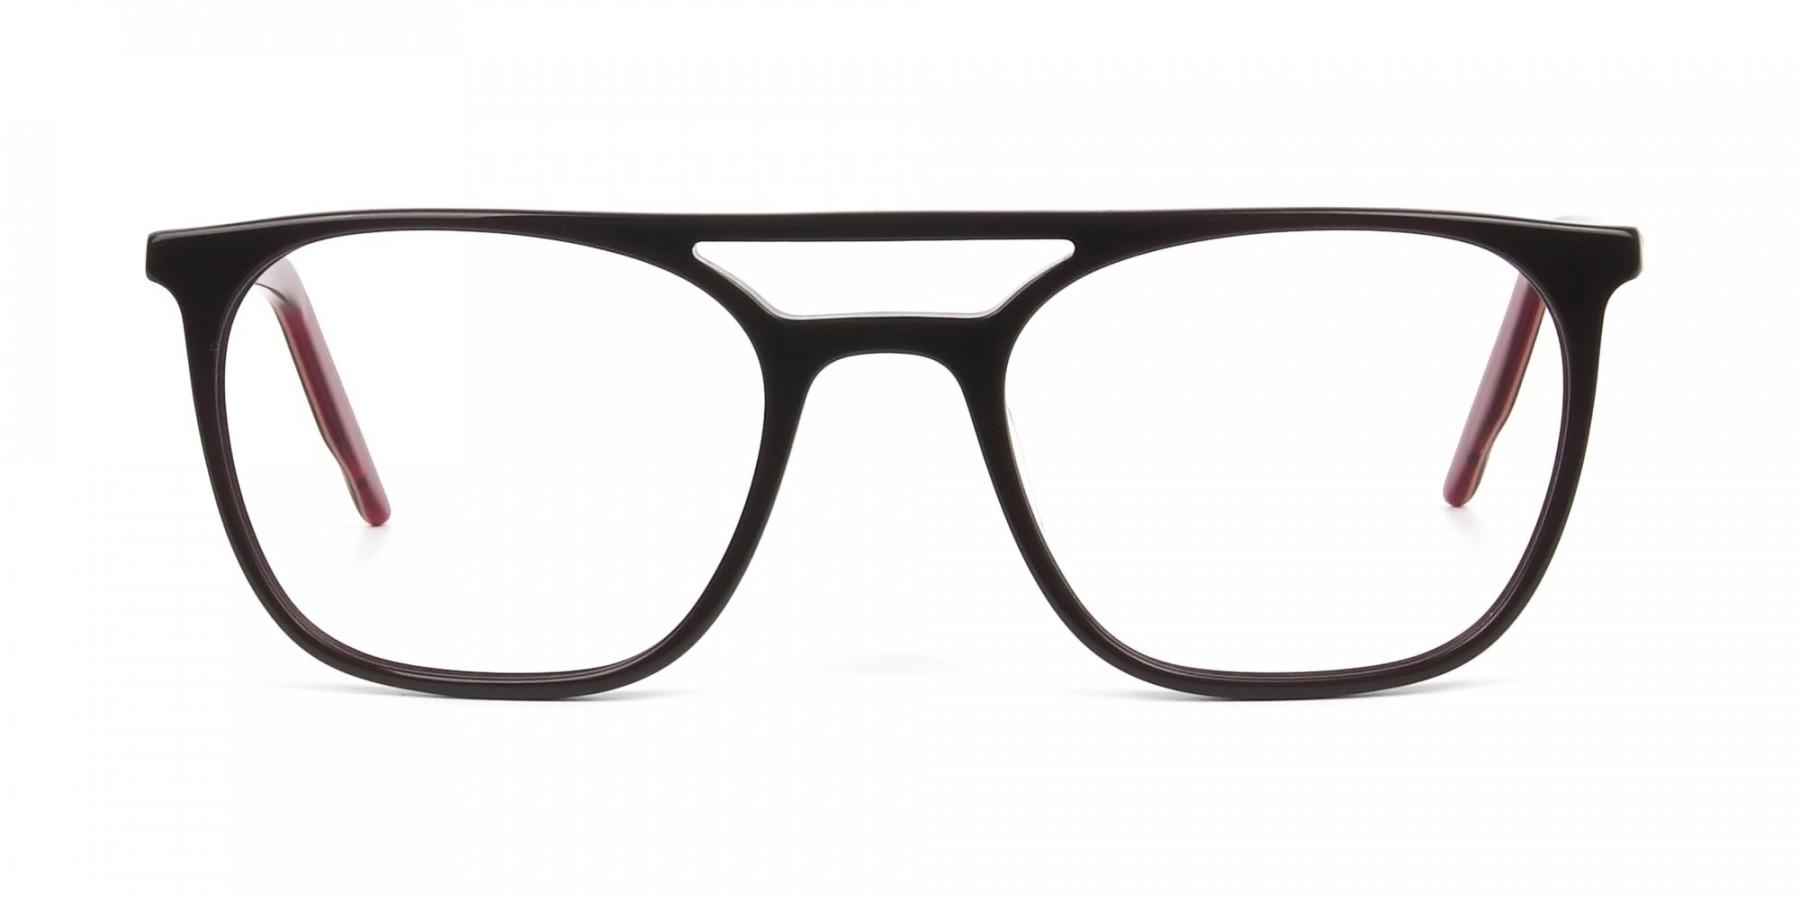 Dark Brown & Red Aviator Spectacles  - 1